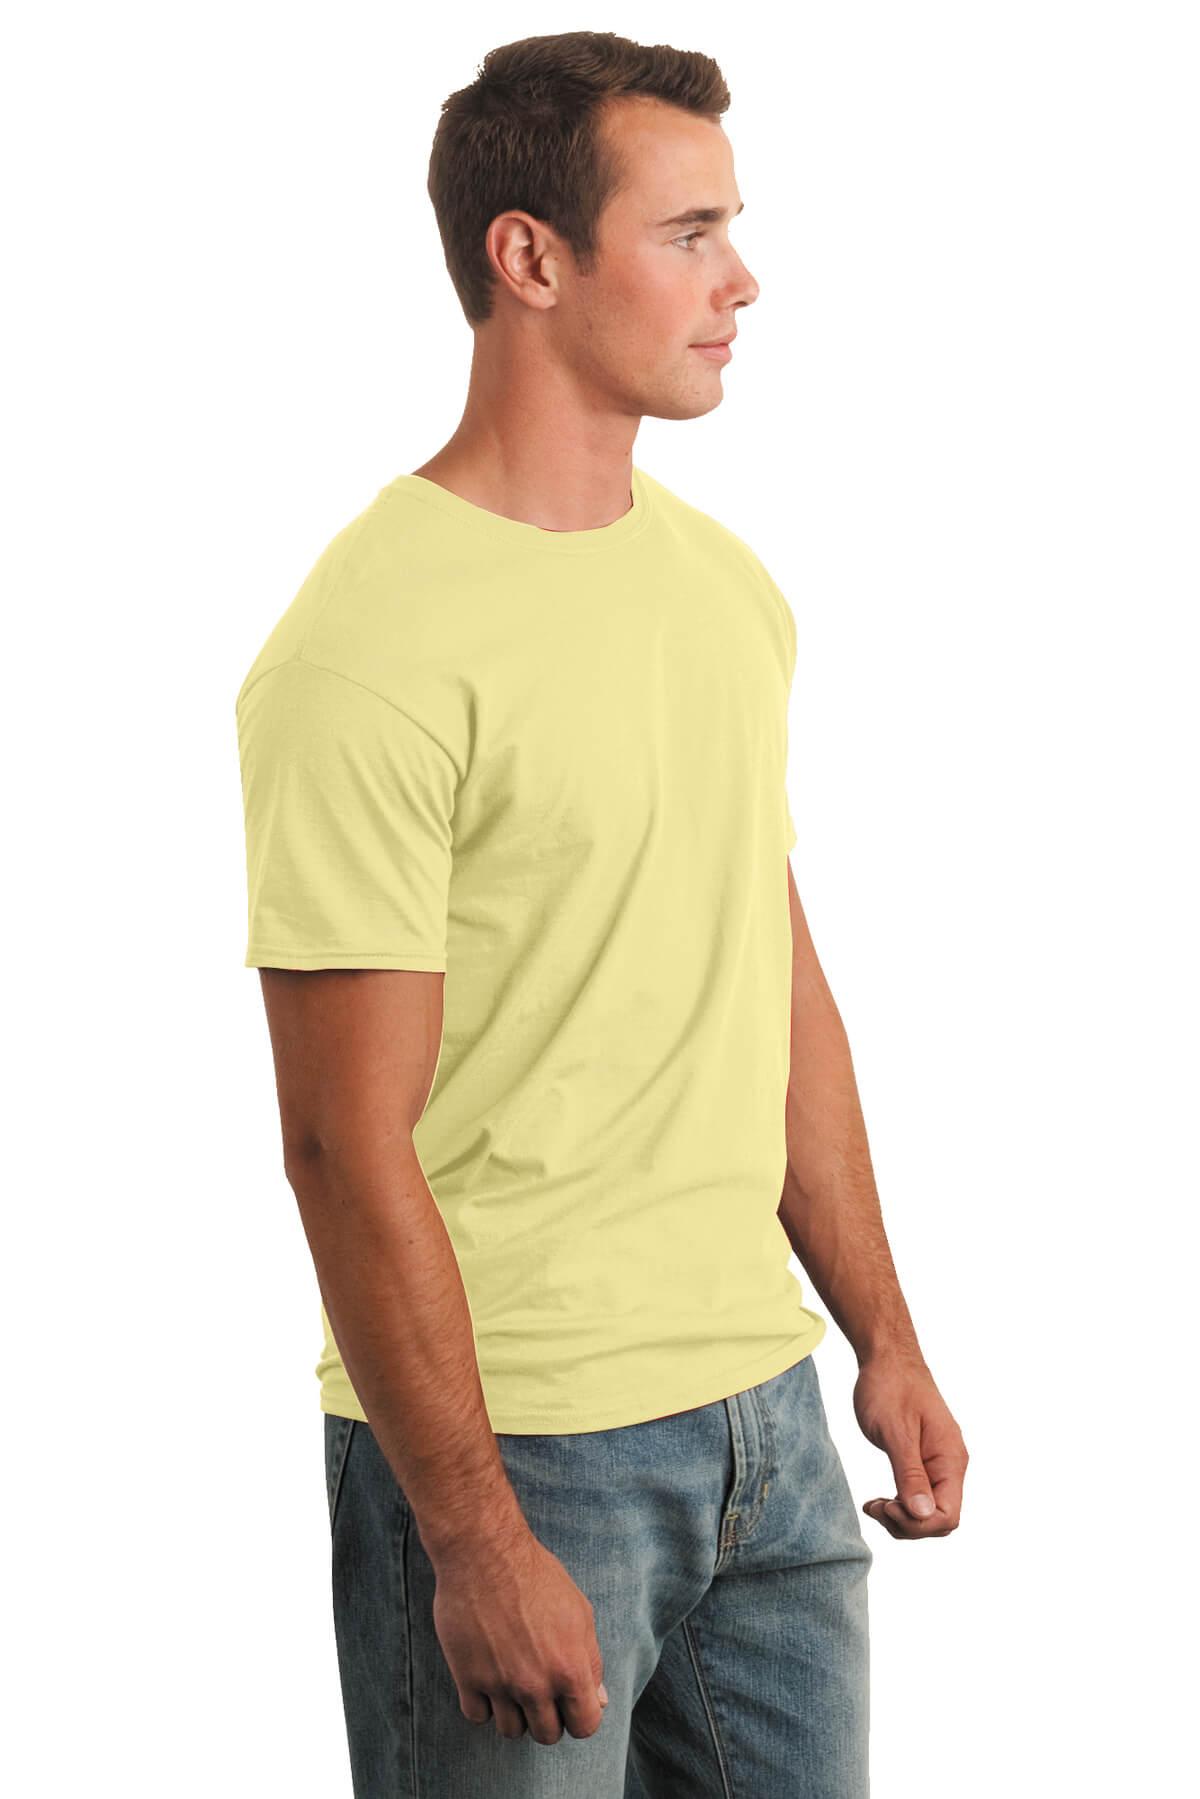 Corn Silk T-Shirt Model Side